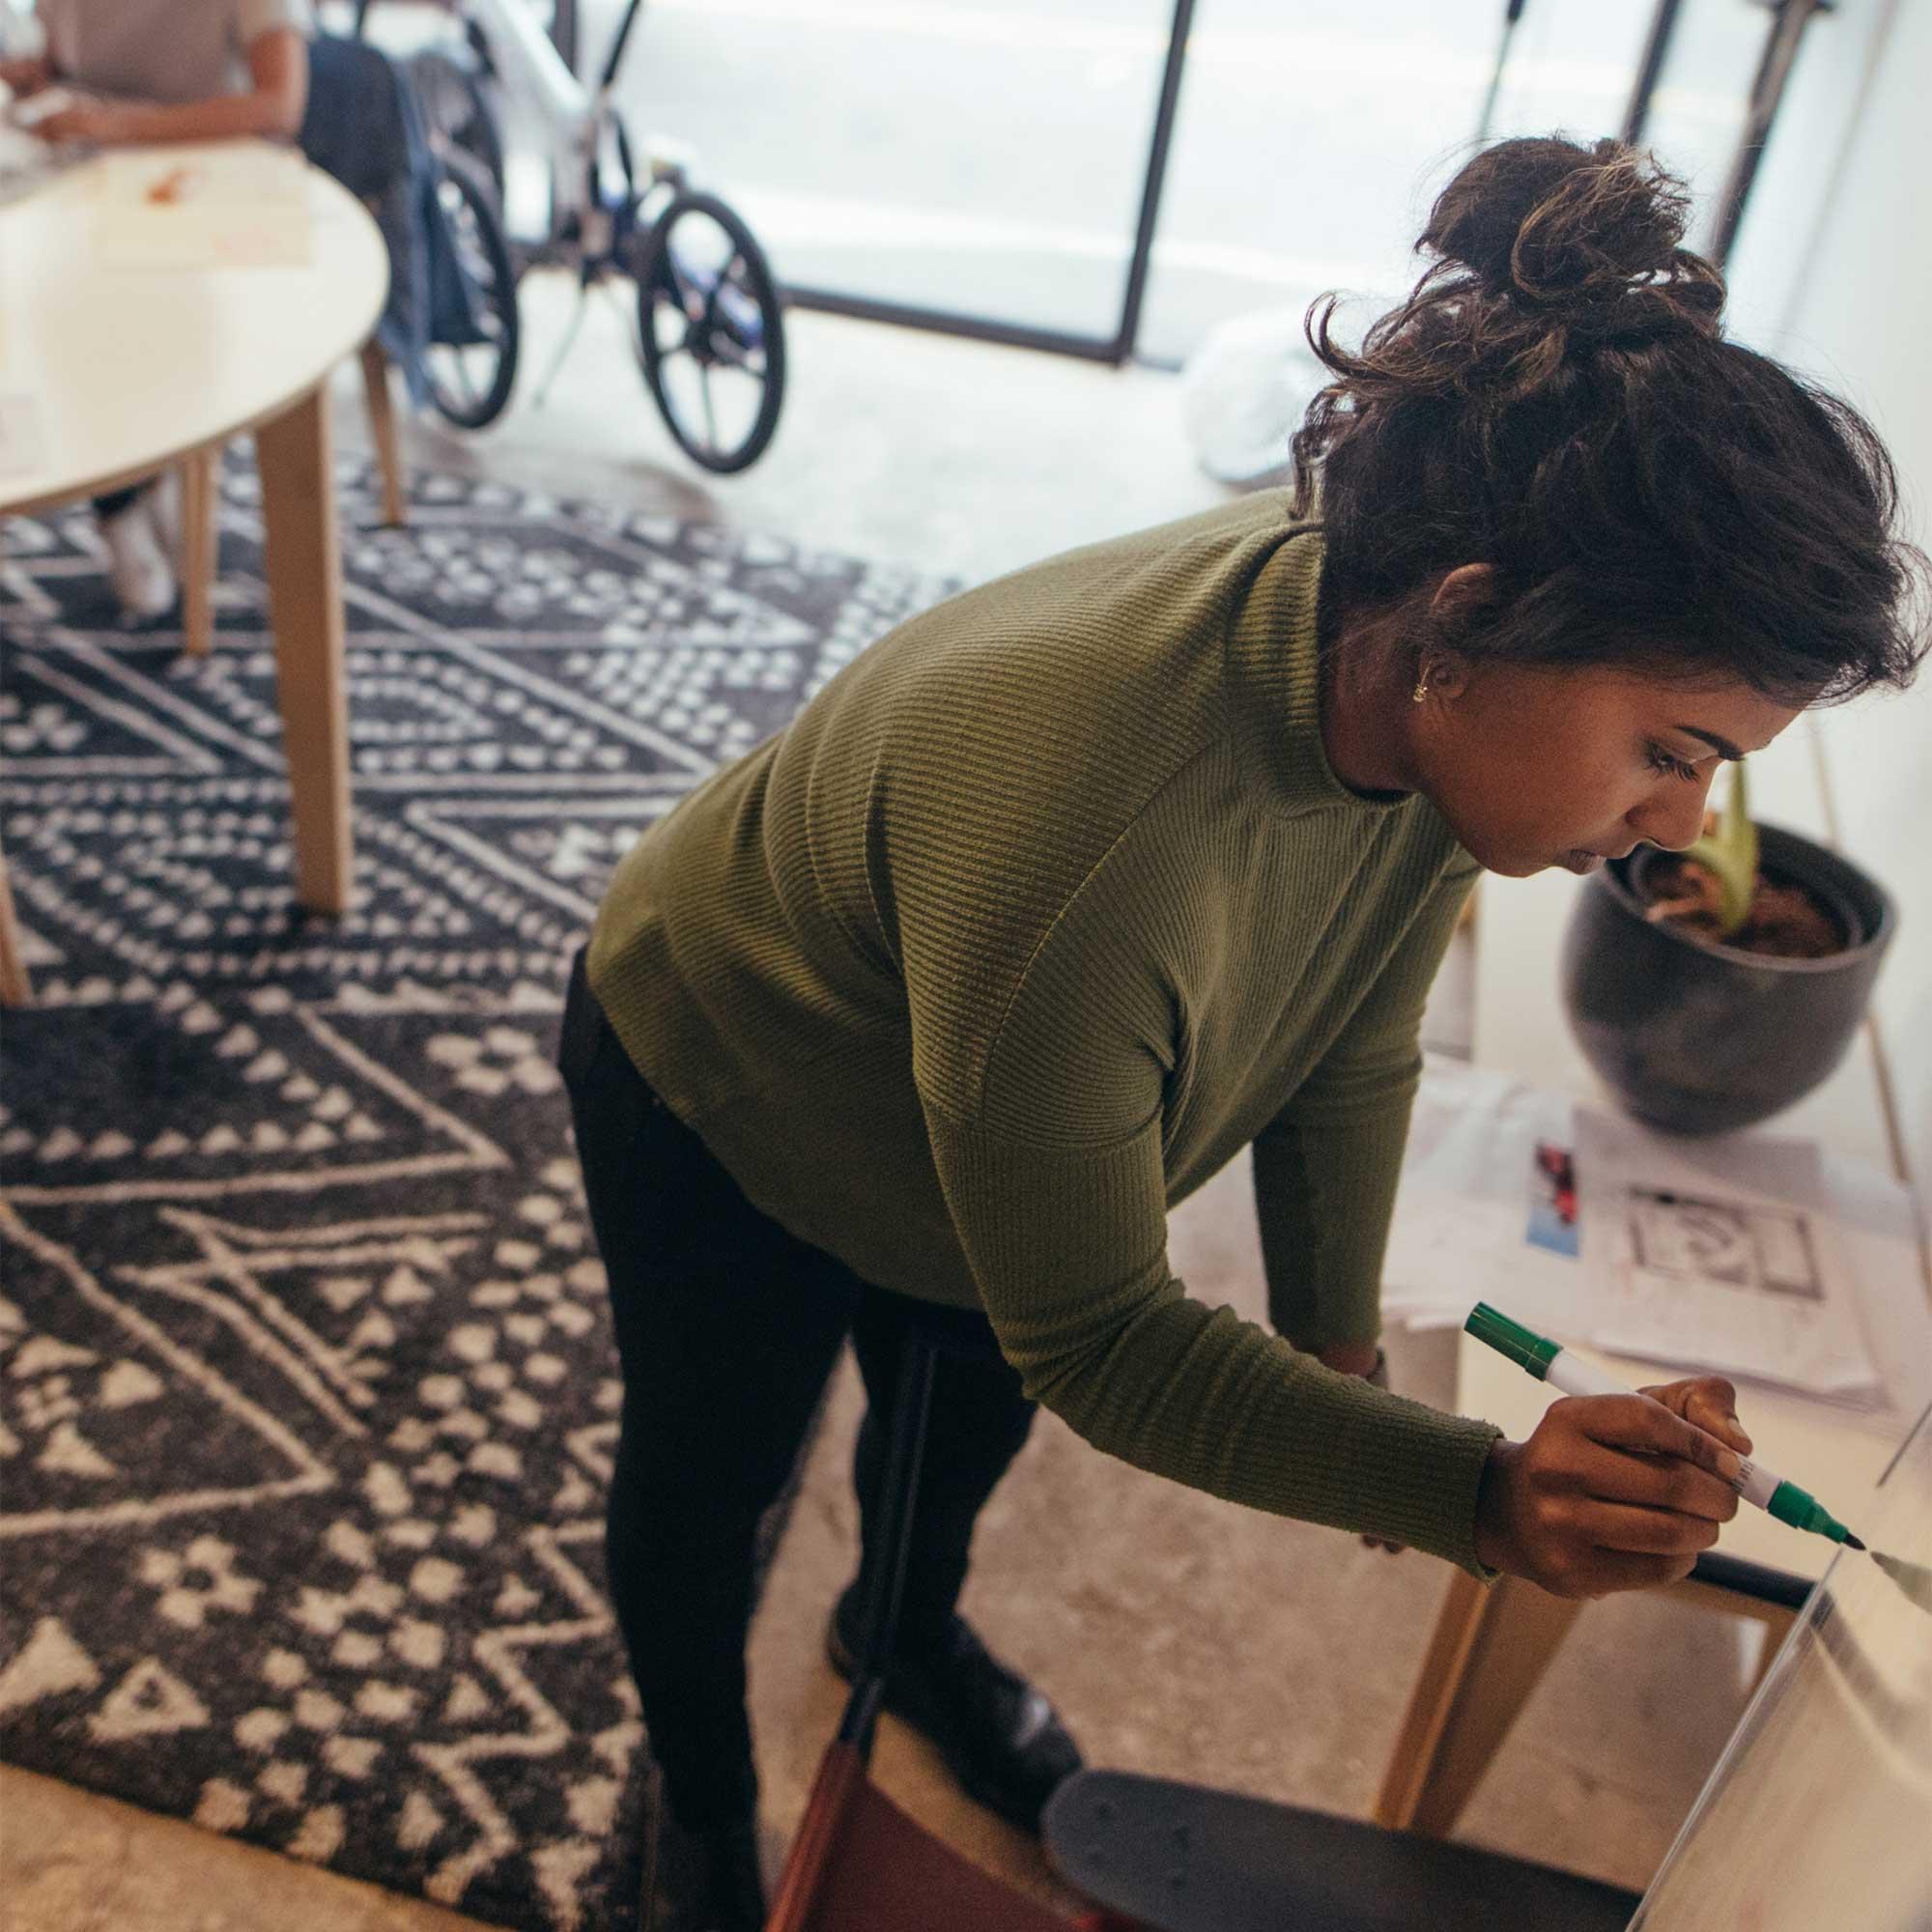 Creative Staff behind post-it note strewn window